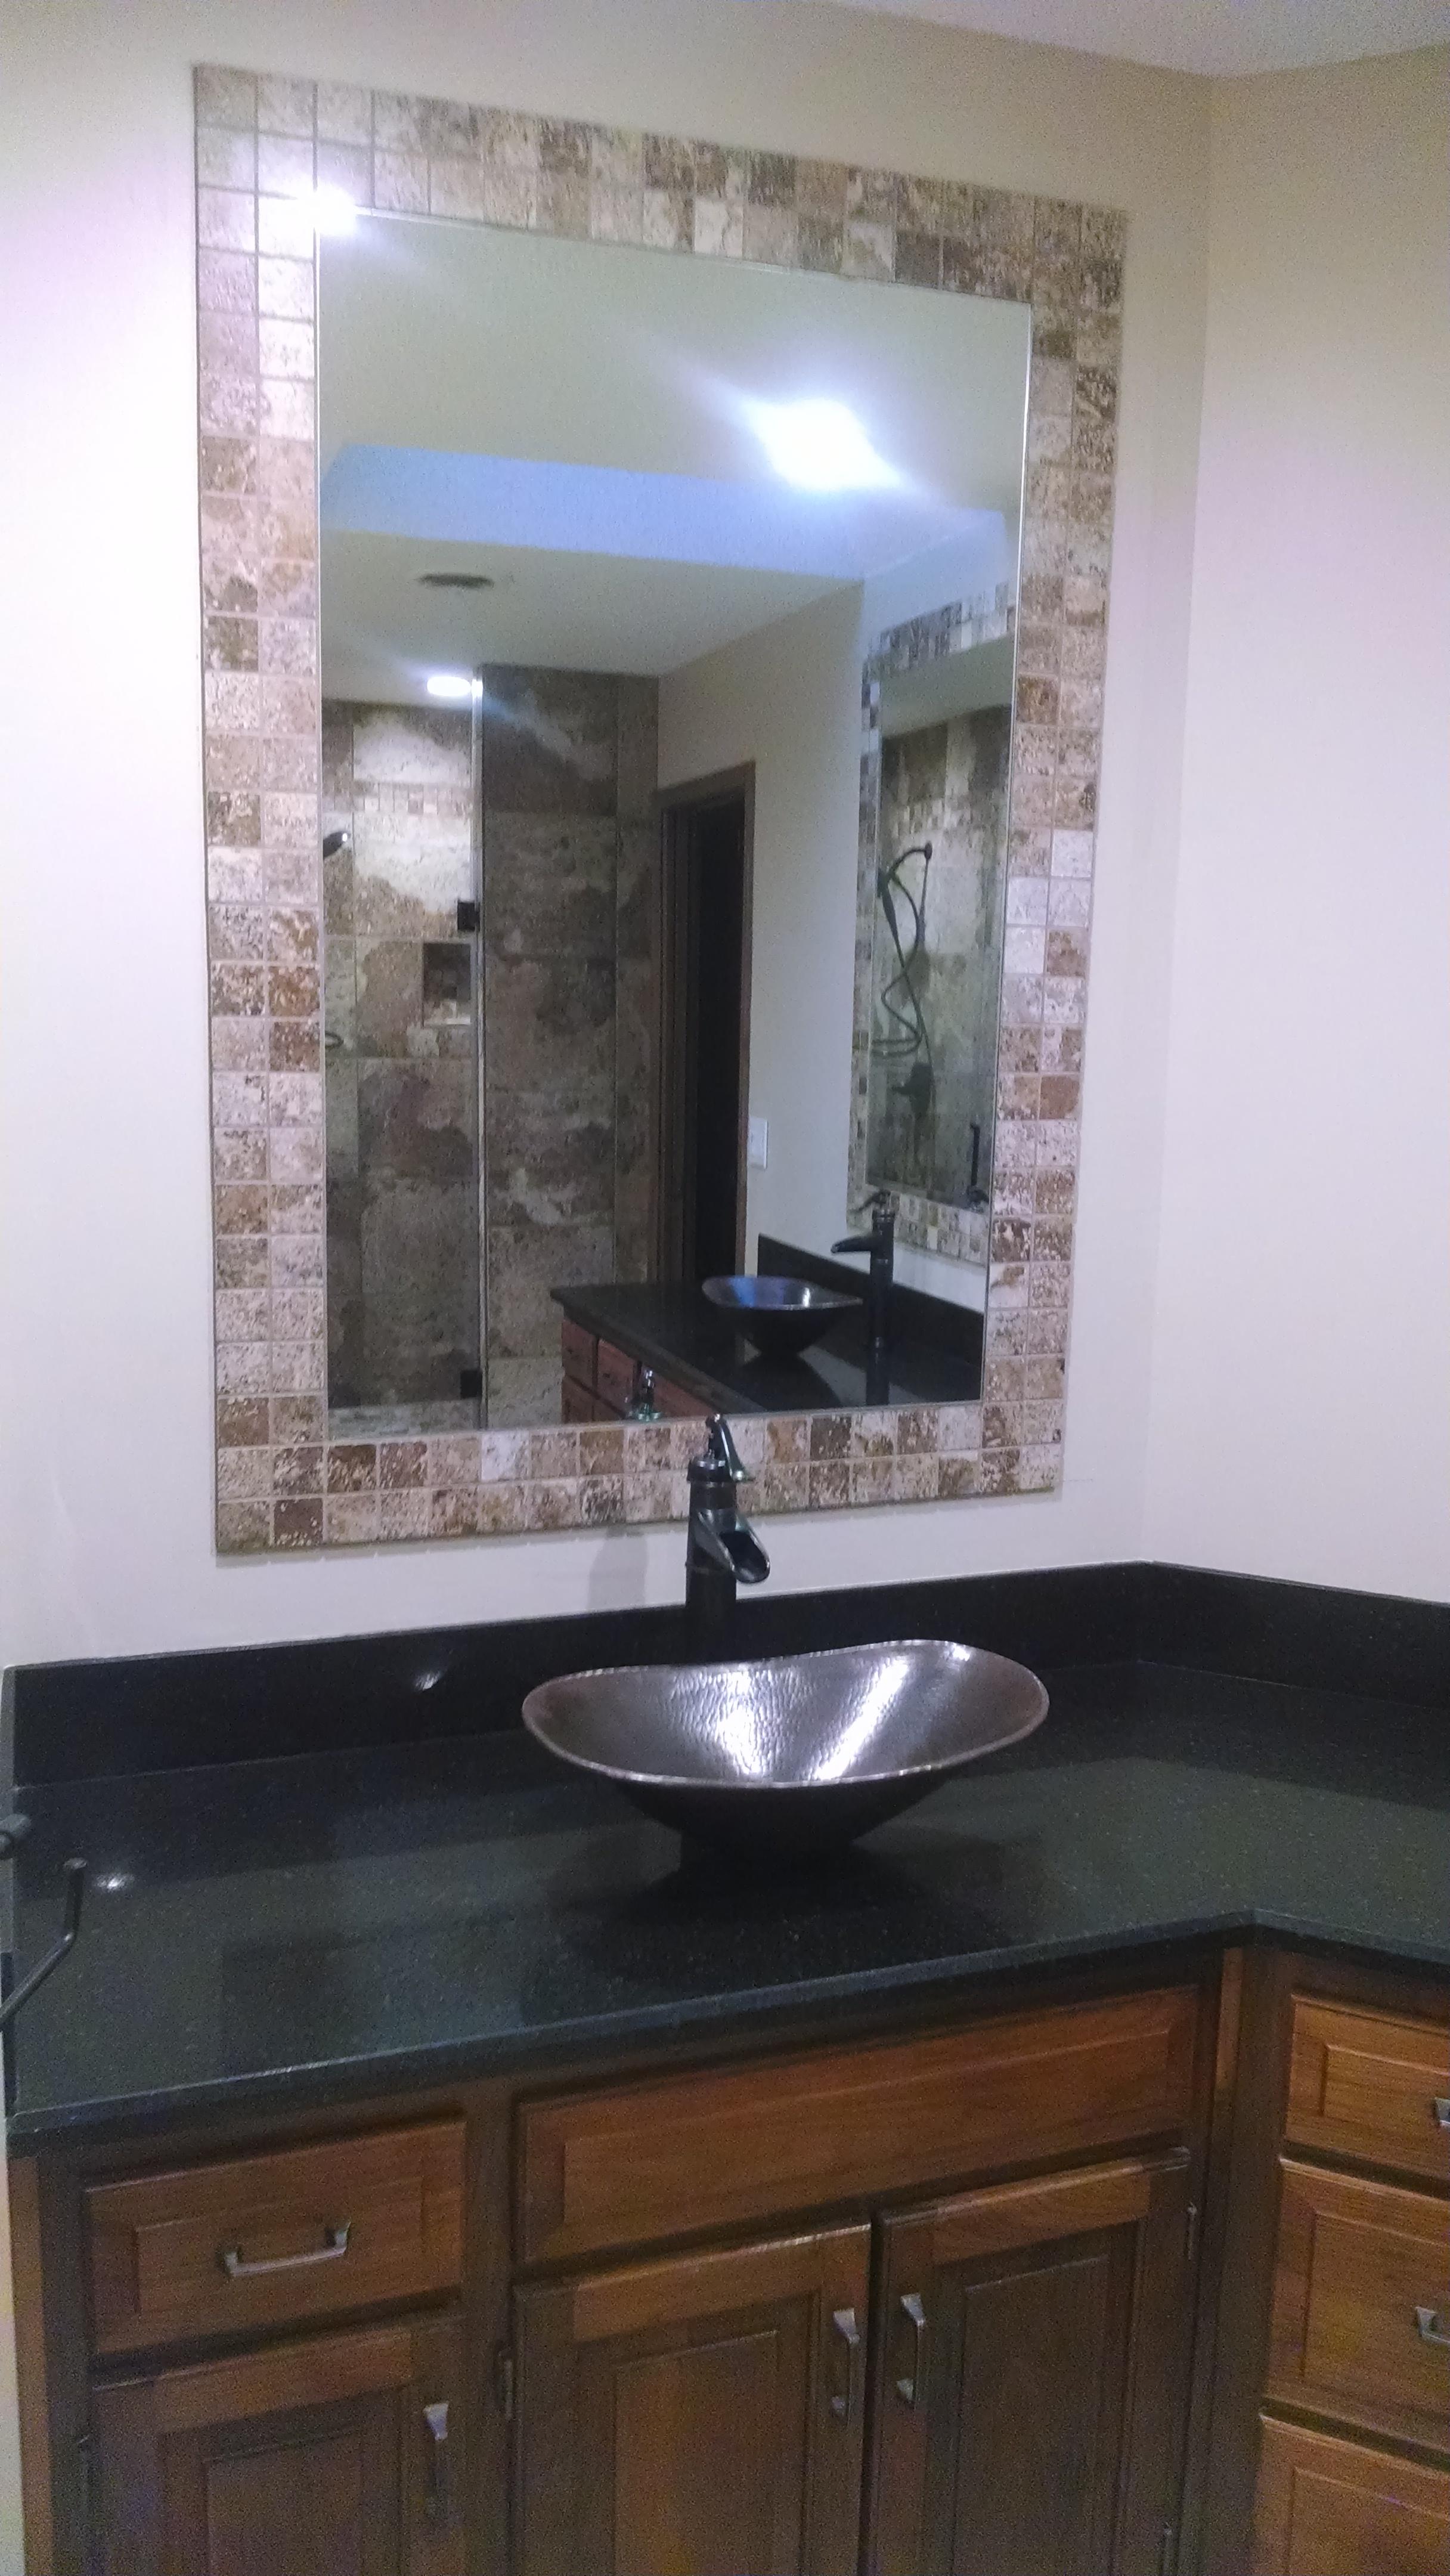 Bathroom Faucets Kansas City we install tile north kansas city remodeling - floor tile